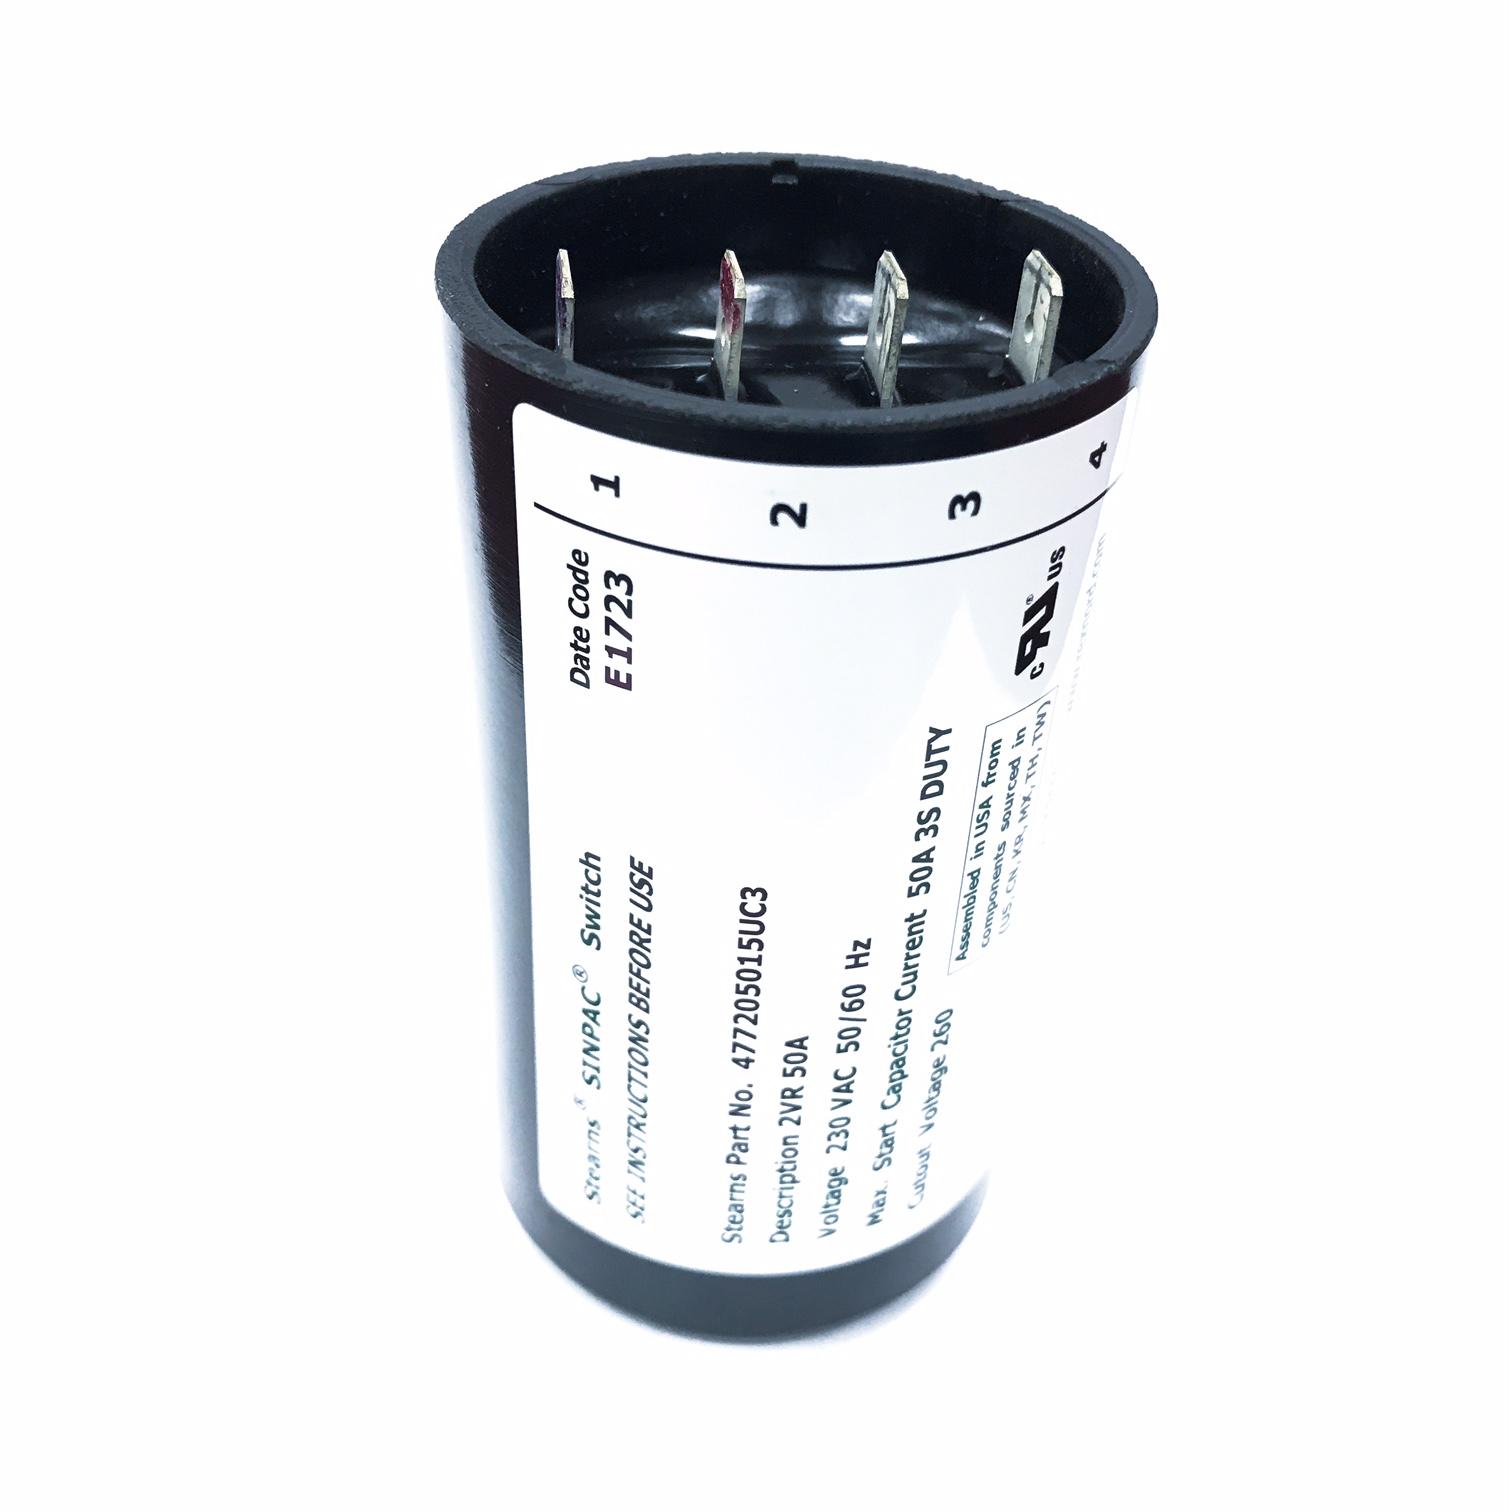 hight resolution of oreck xl 9200 wiring diagram s schematic diagramoreck xl 9200 wiring diagram s wiring diagram shark